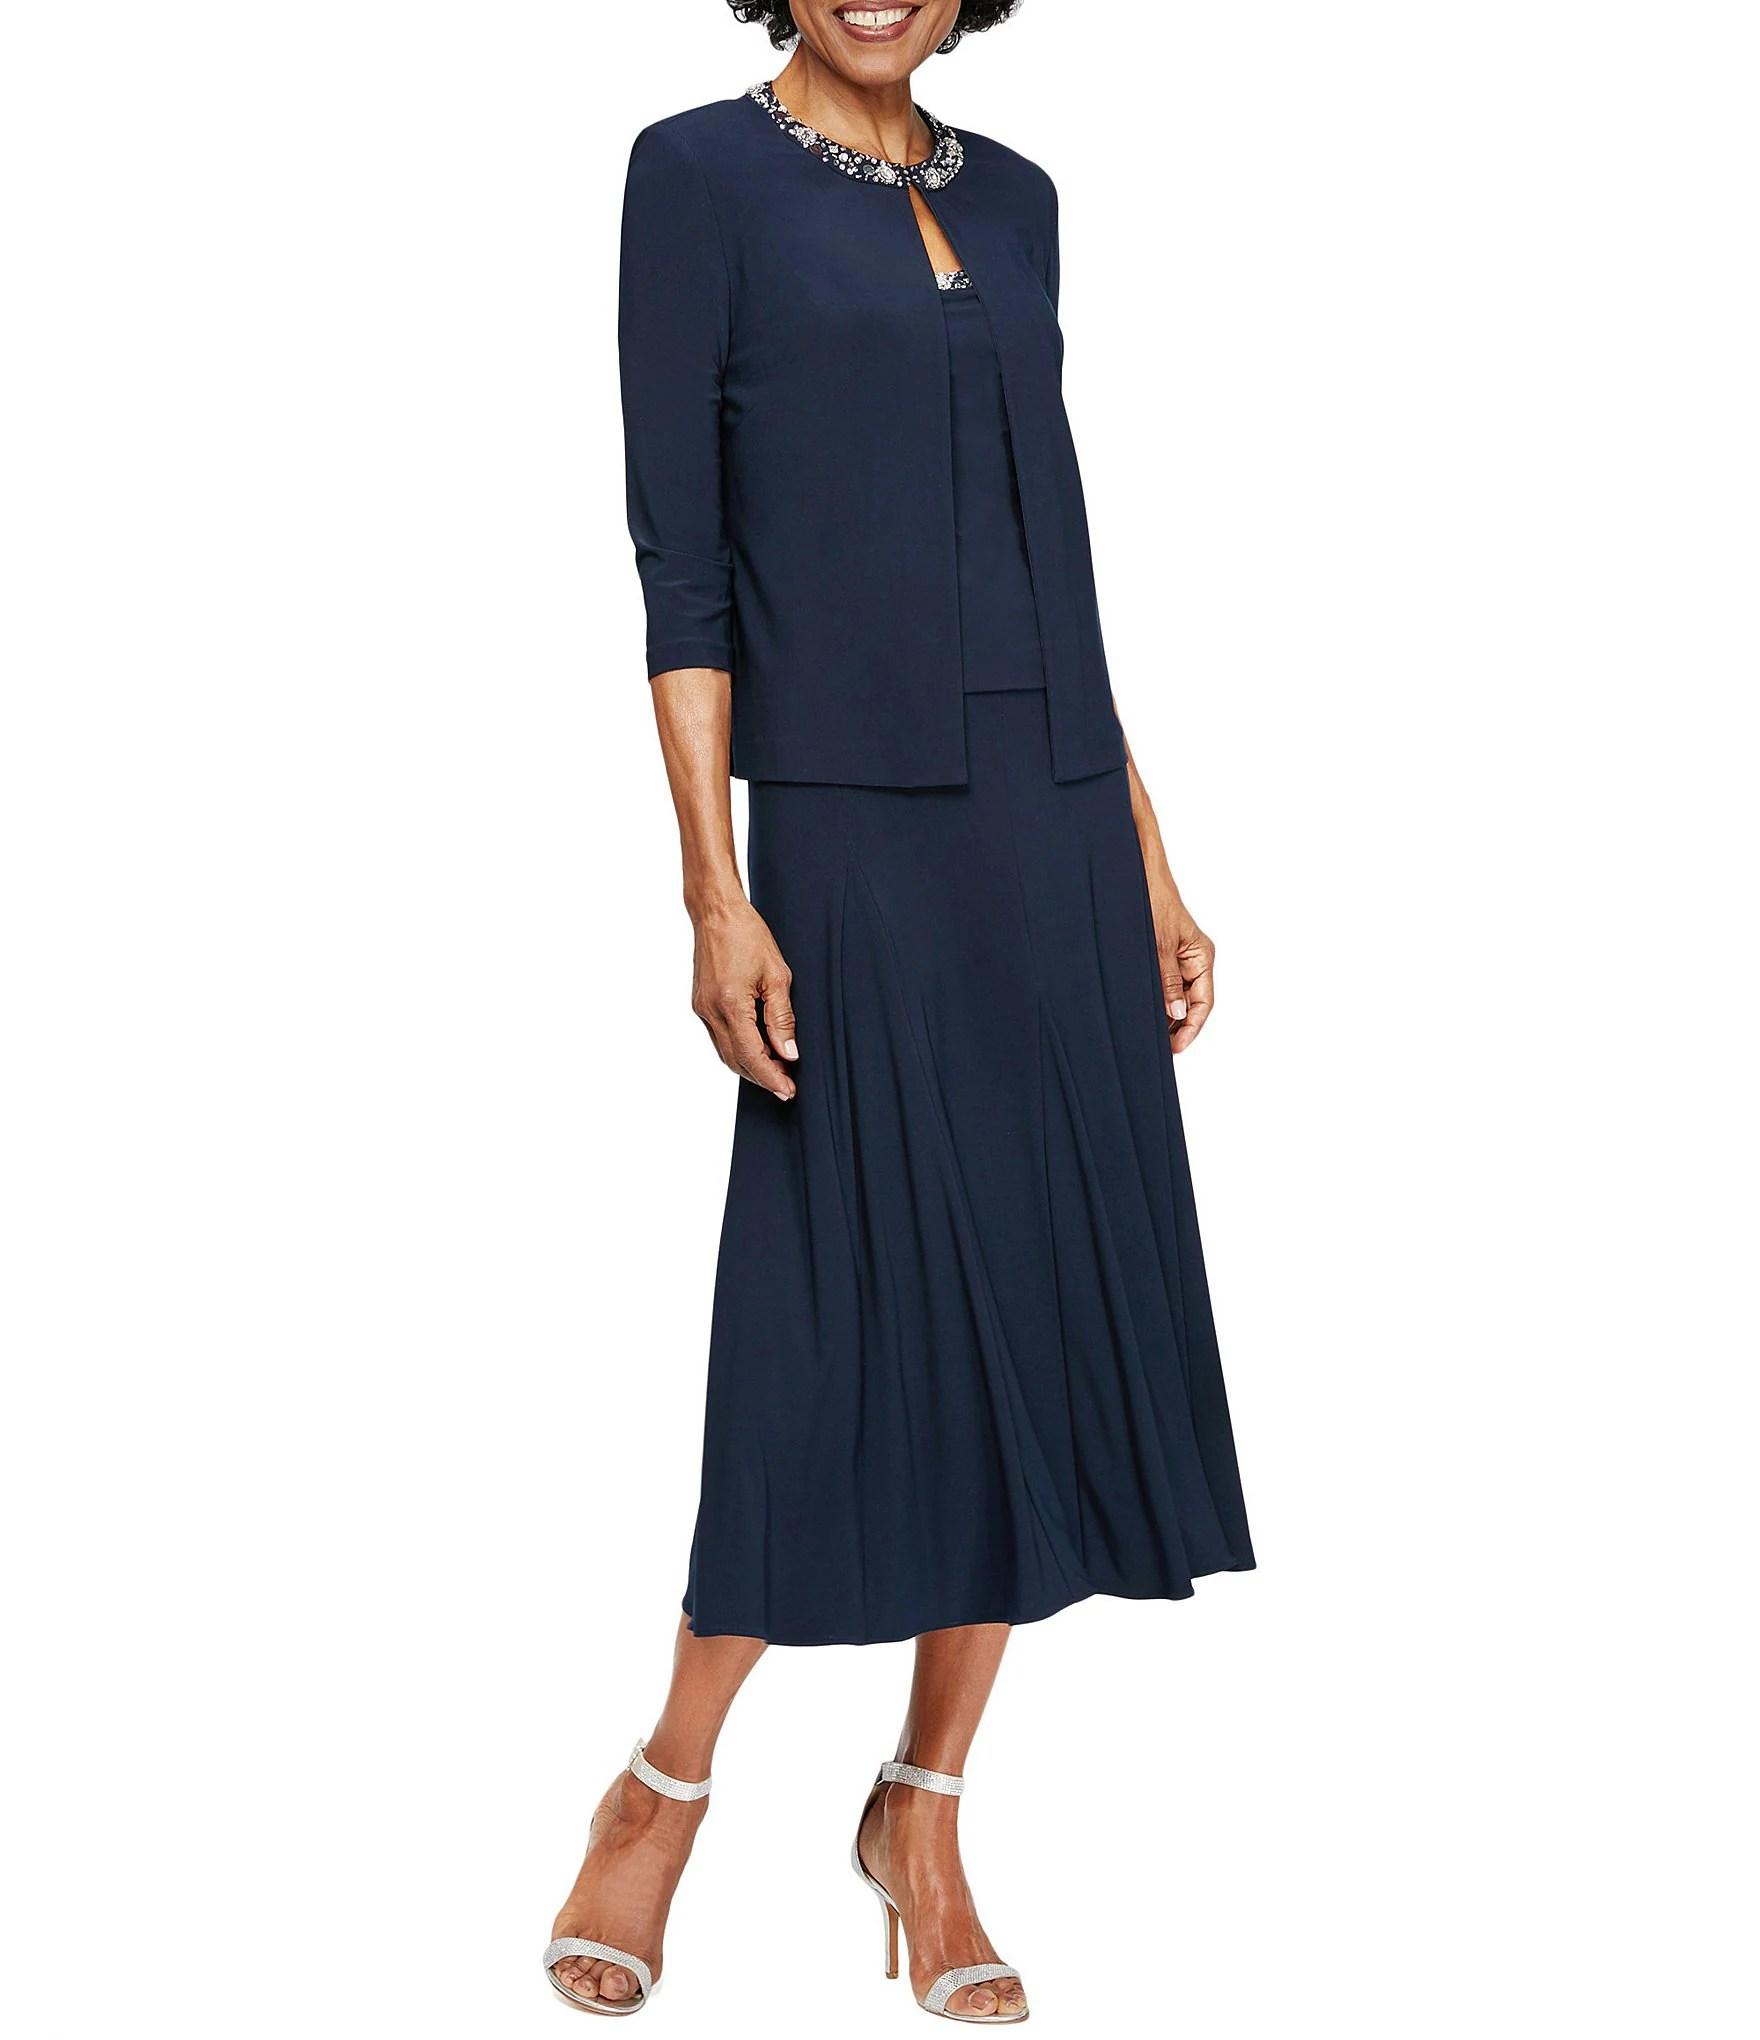 Macys Gowns Sale